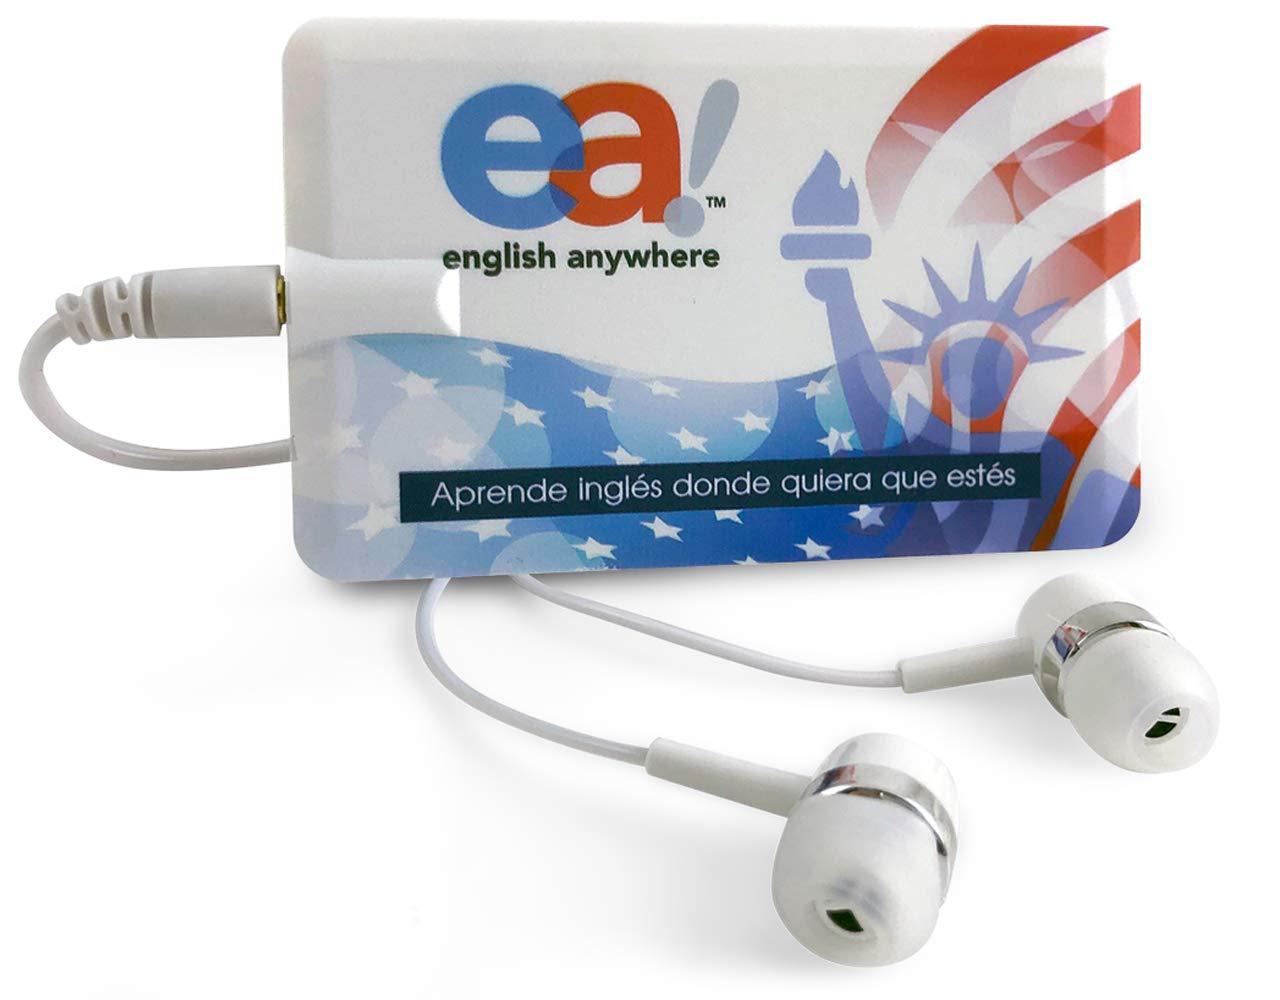 Curso de Ingles - Aprender Ingles Basico | EnglishCourse EA English Anywhere | Incluye Reproductor Mp3 Ultra Plano con 90 Lecciones en Audio | Spanish Edition. by EA English Anywhere